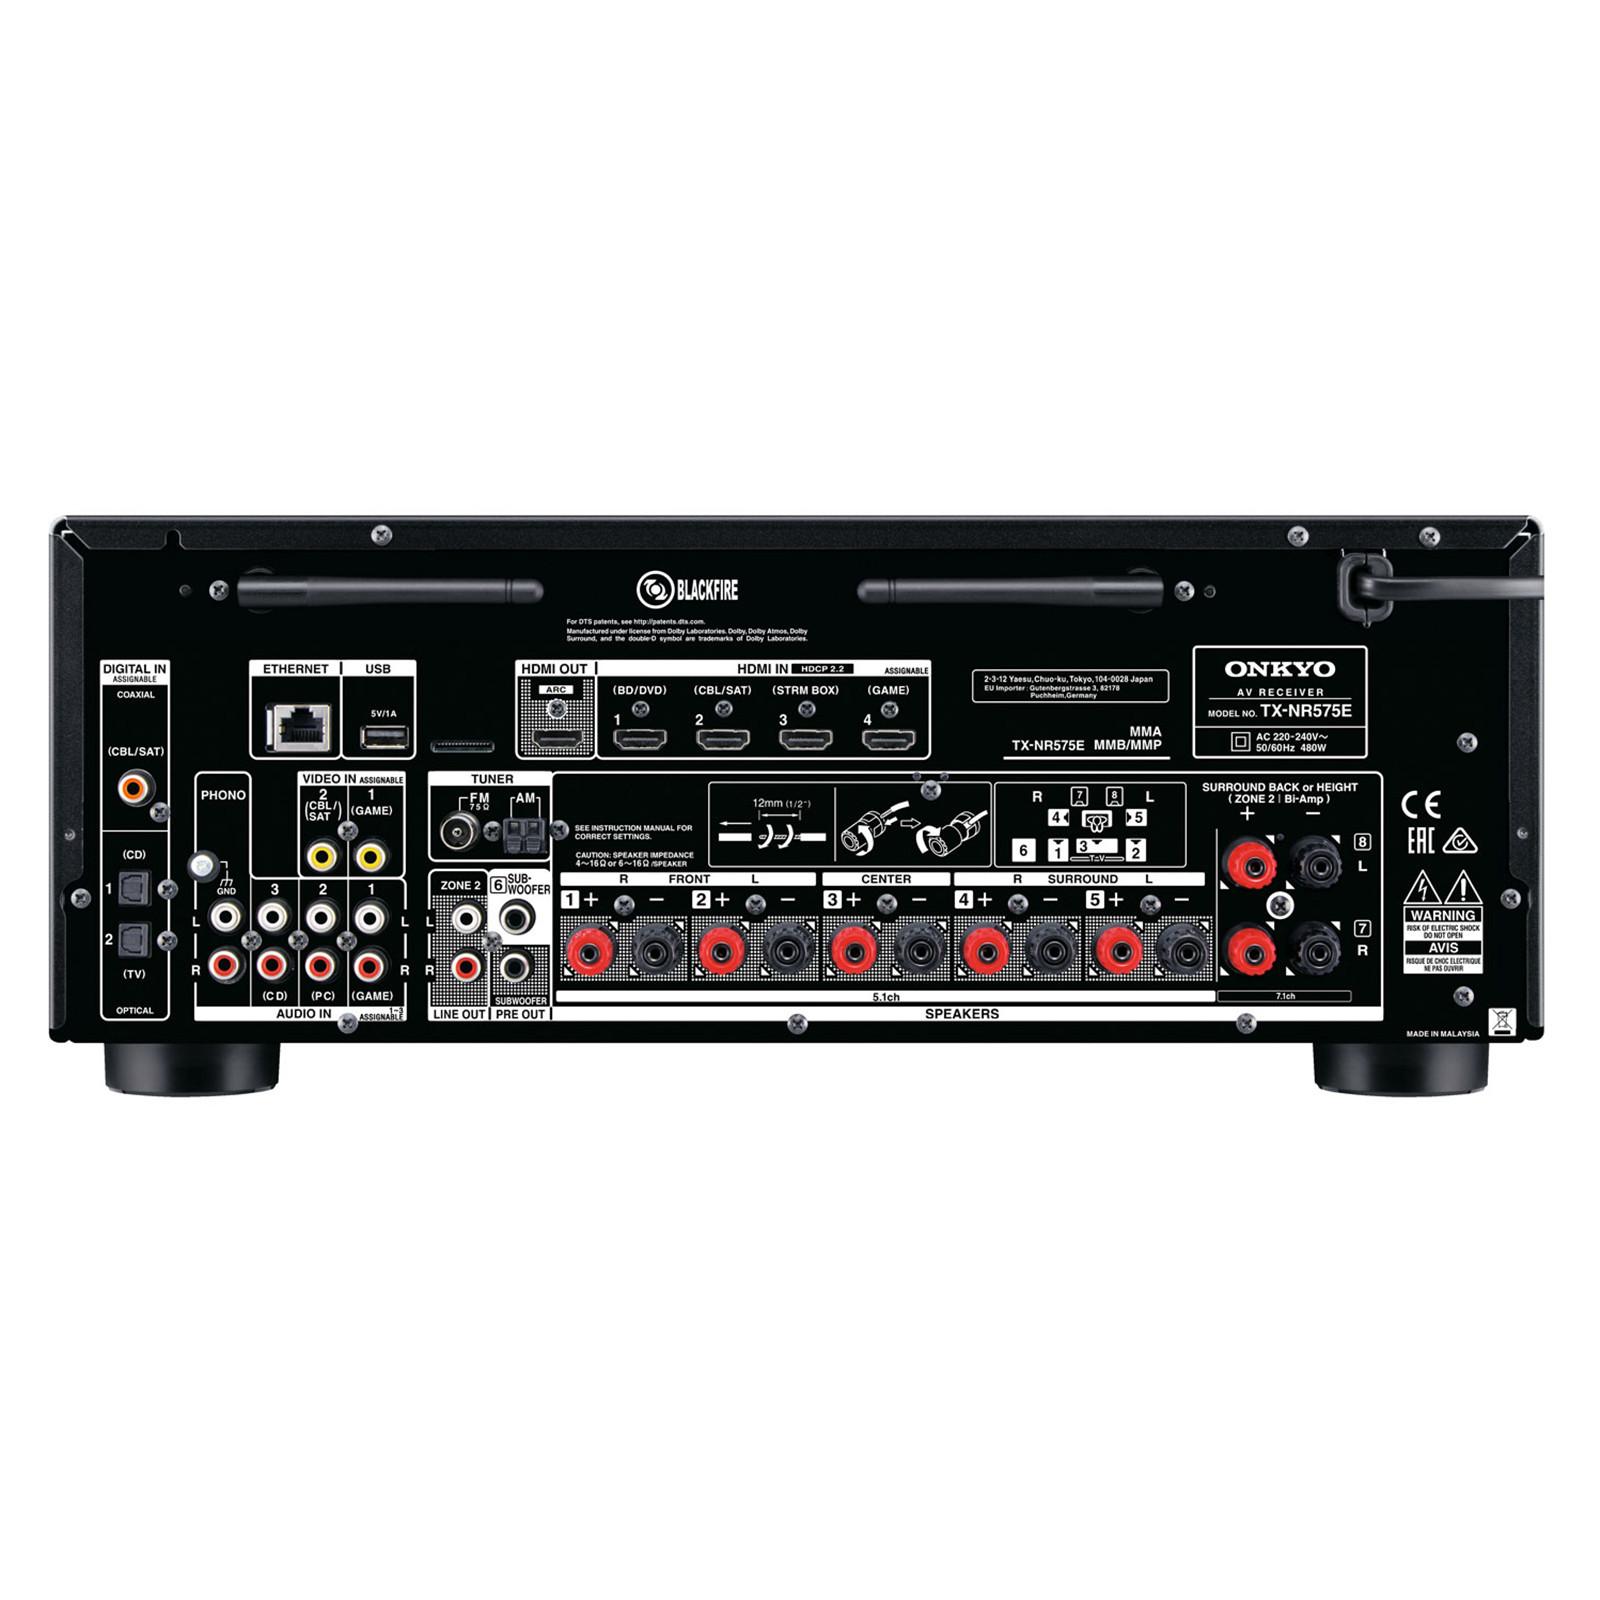 Buy the Onkyo TX-NR575E 7 2 Channel AV Receiver 2 Zone - HDMI 4x In